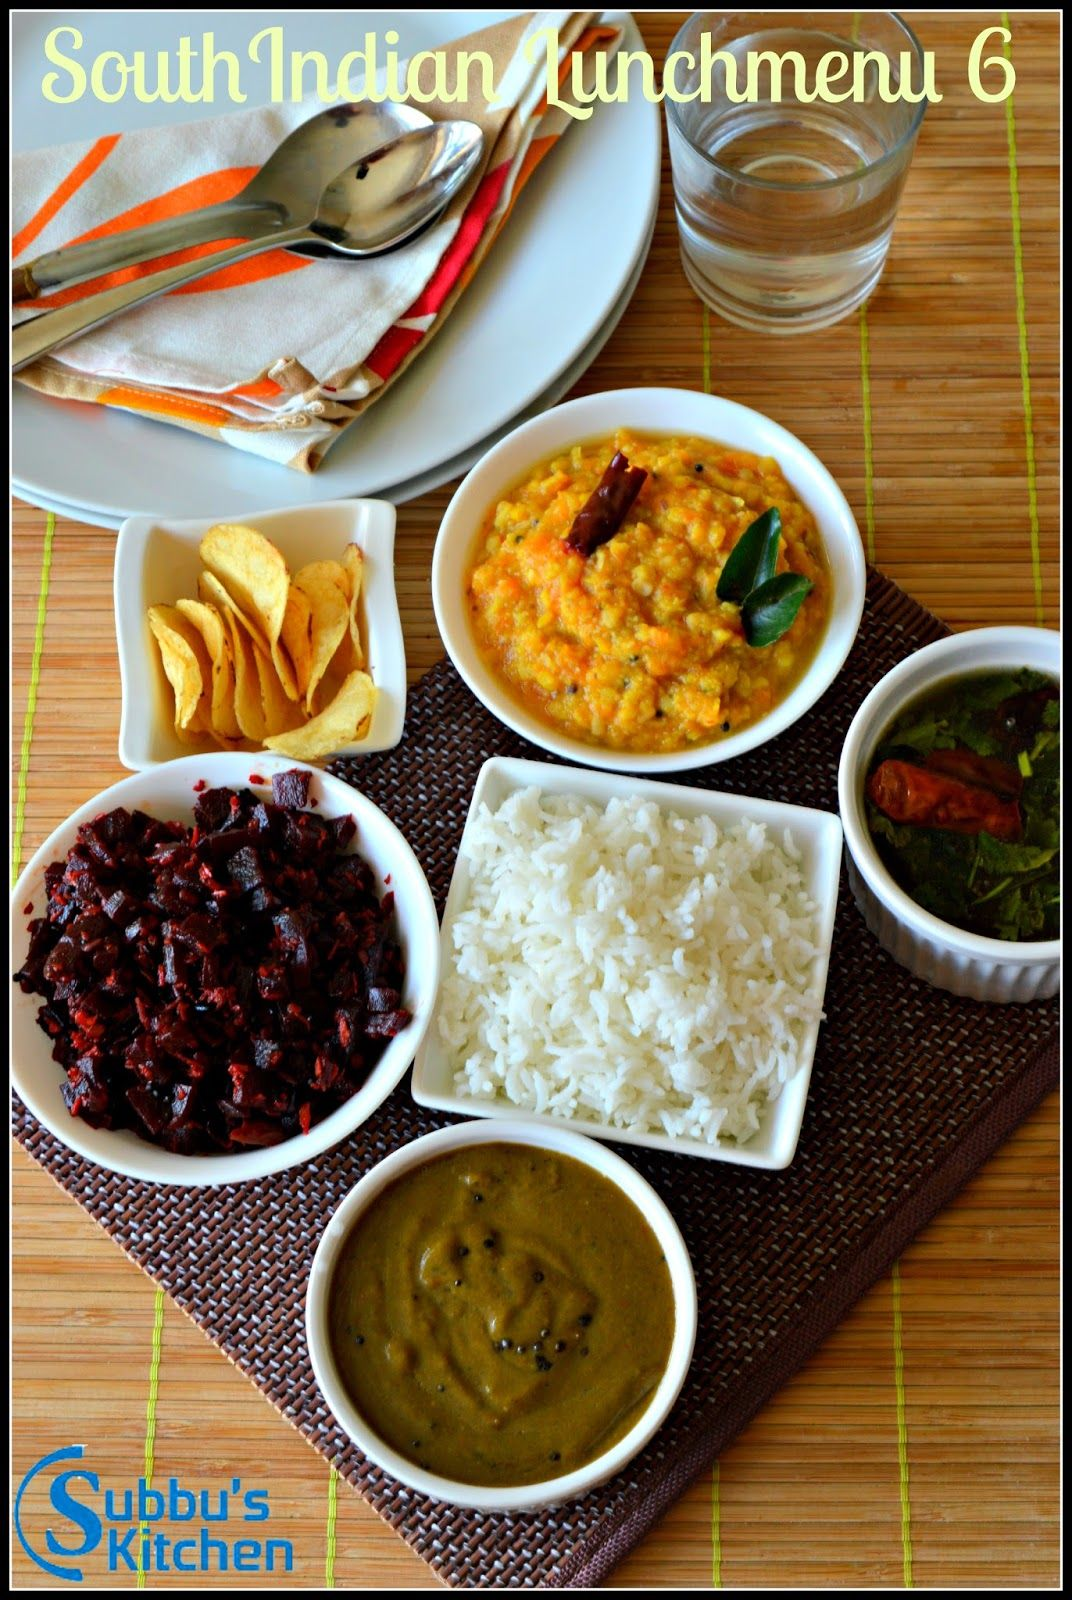 Subbus Kitchen South Indian Lunch Menu 6 Curryleaves Kuzhambu Kottu Rasam Beetroot Poriyal Pum Indian Food Recipes Indian Food Recipes Vegetarian Cooking